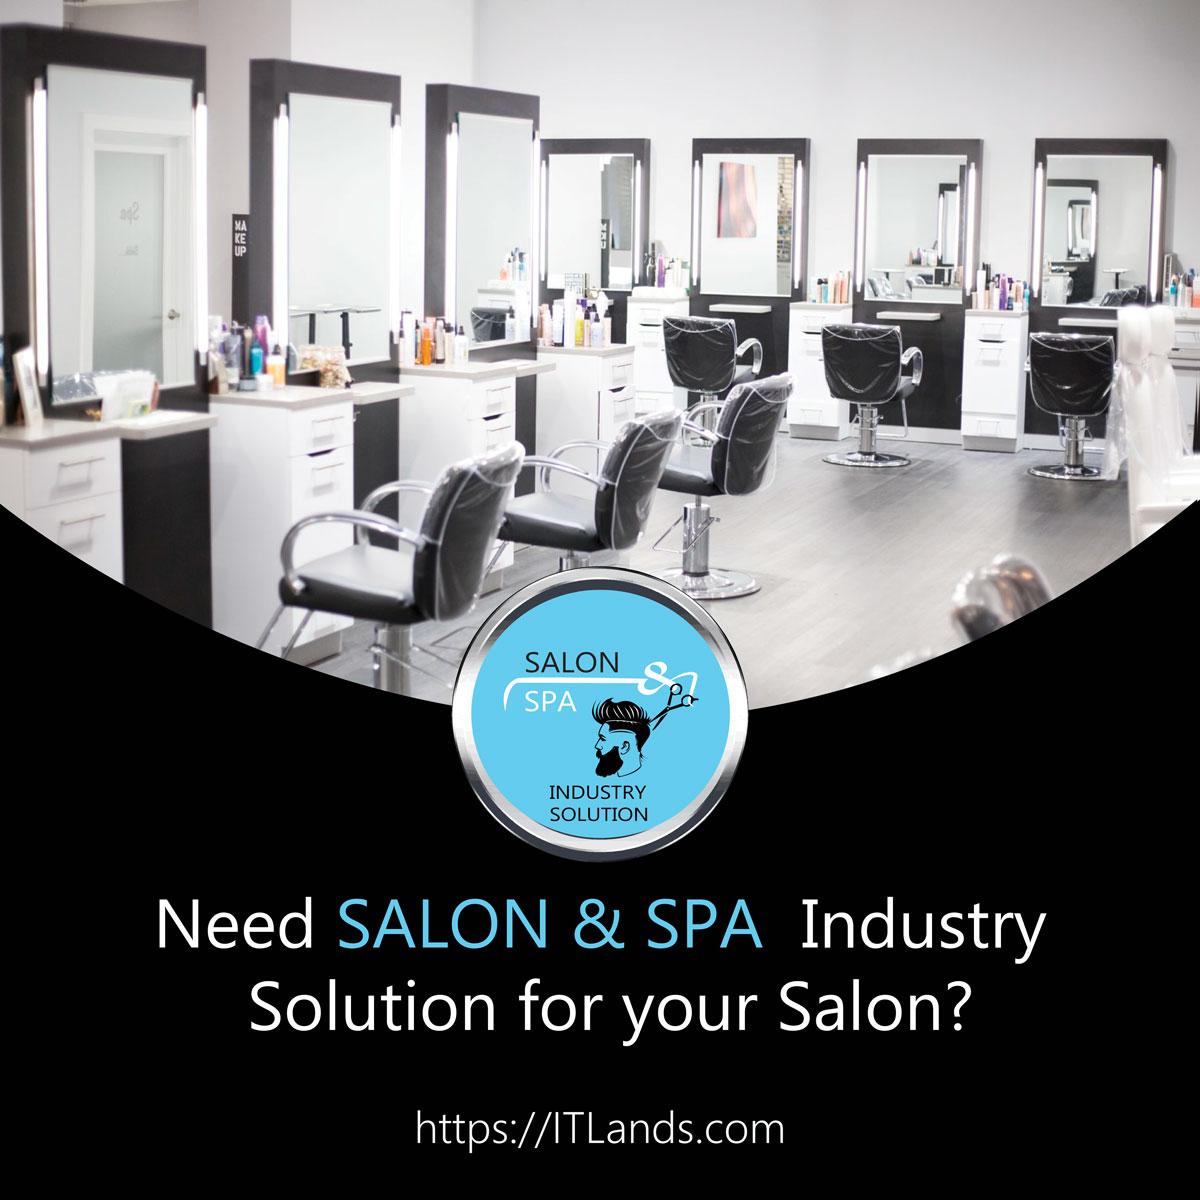 Salon & Spa Industry Solution